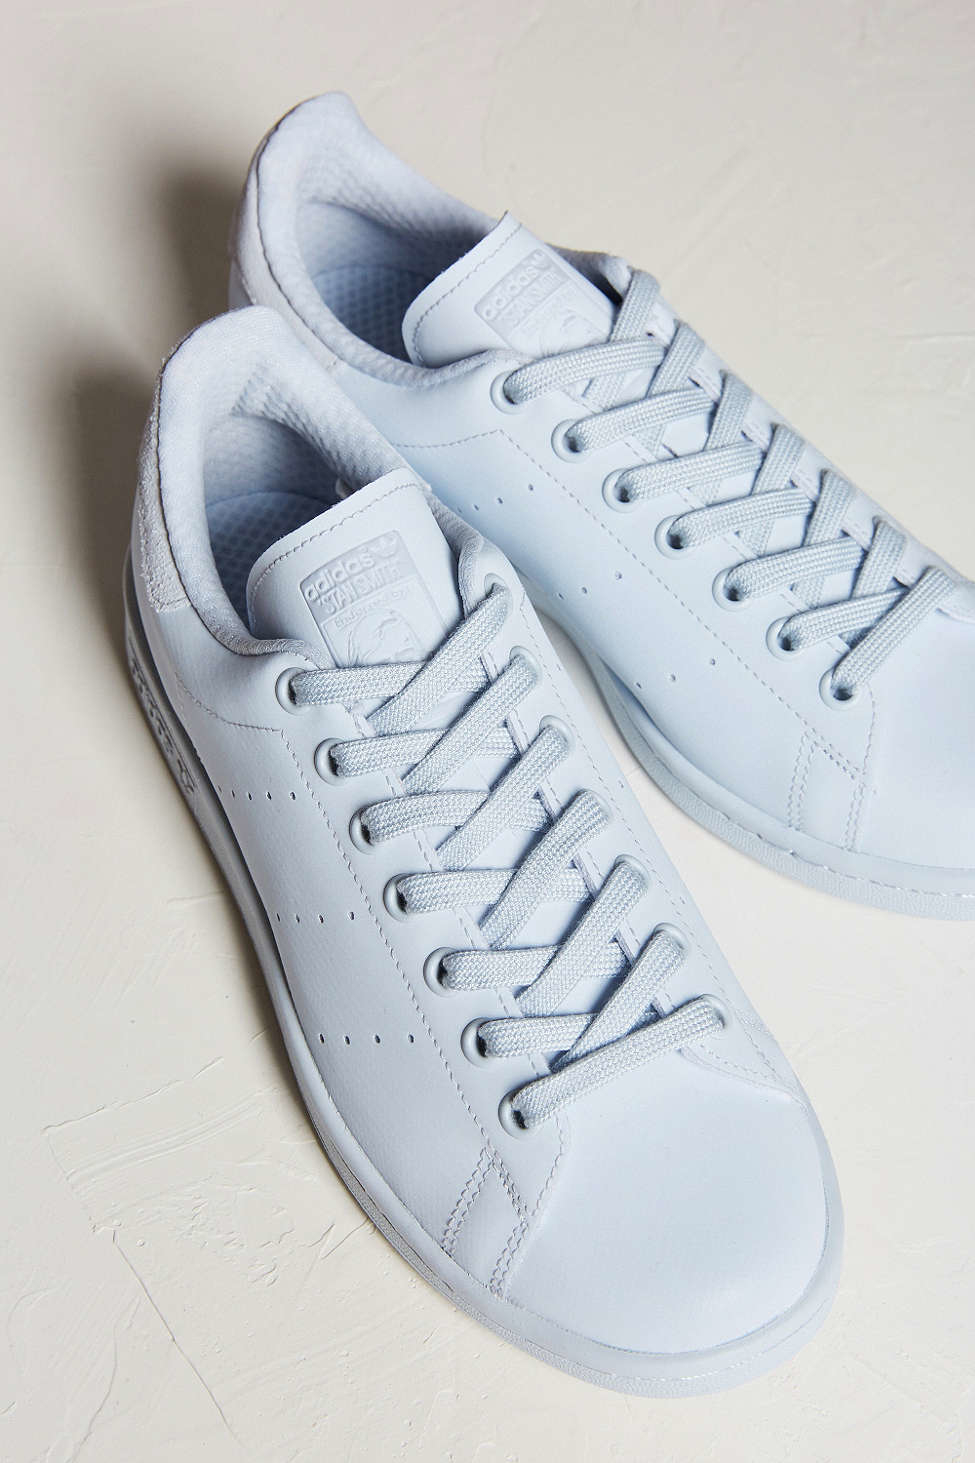 Adidas Originals Blue Originals Pastel Supercolor Stan Smith Sneaker